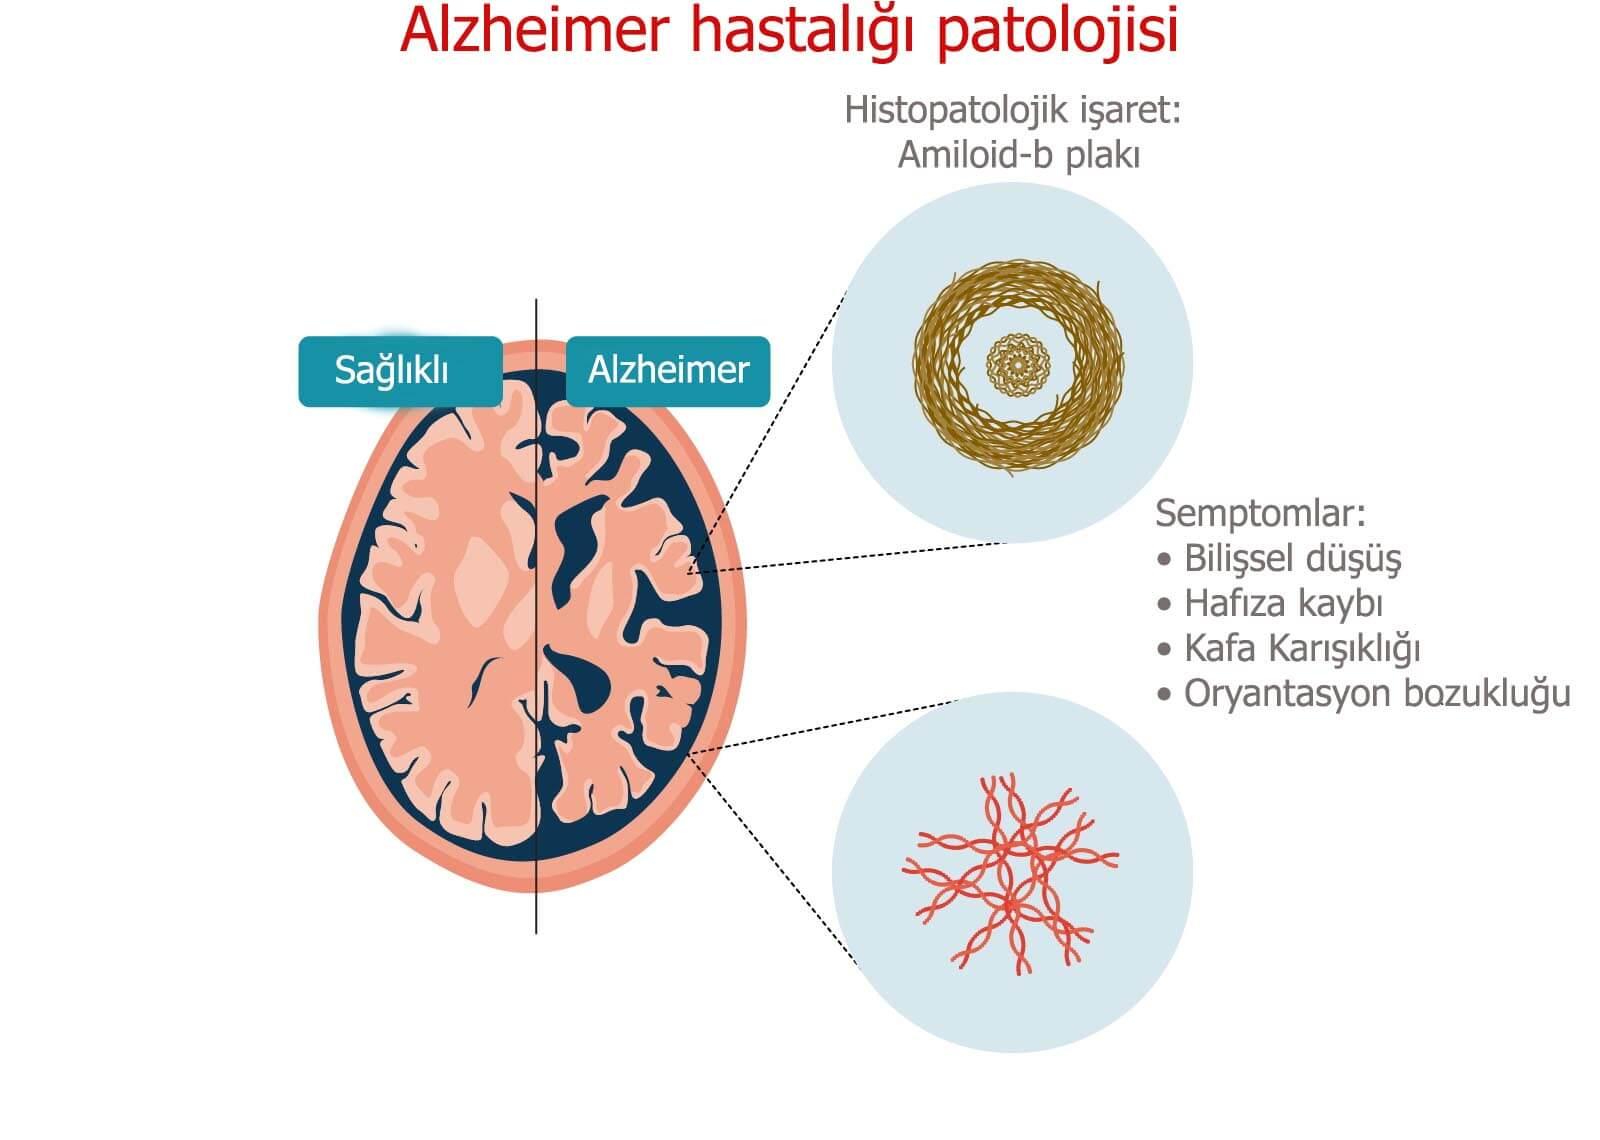 alzheimer hastalığı patolojisi